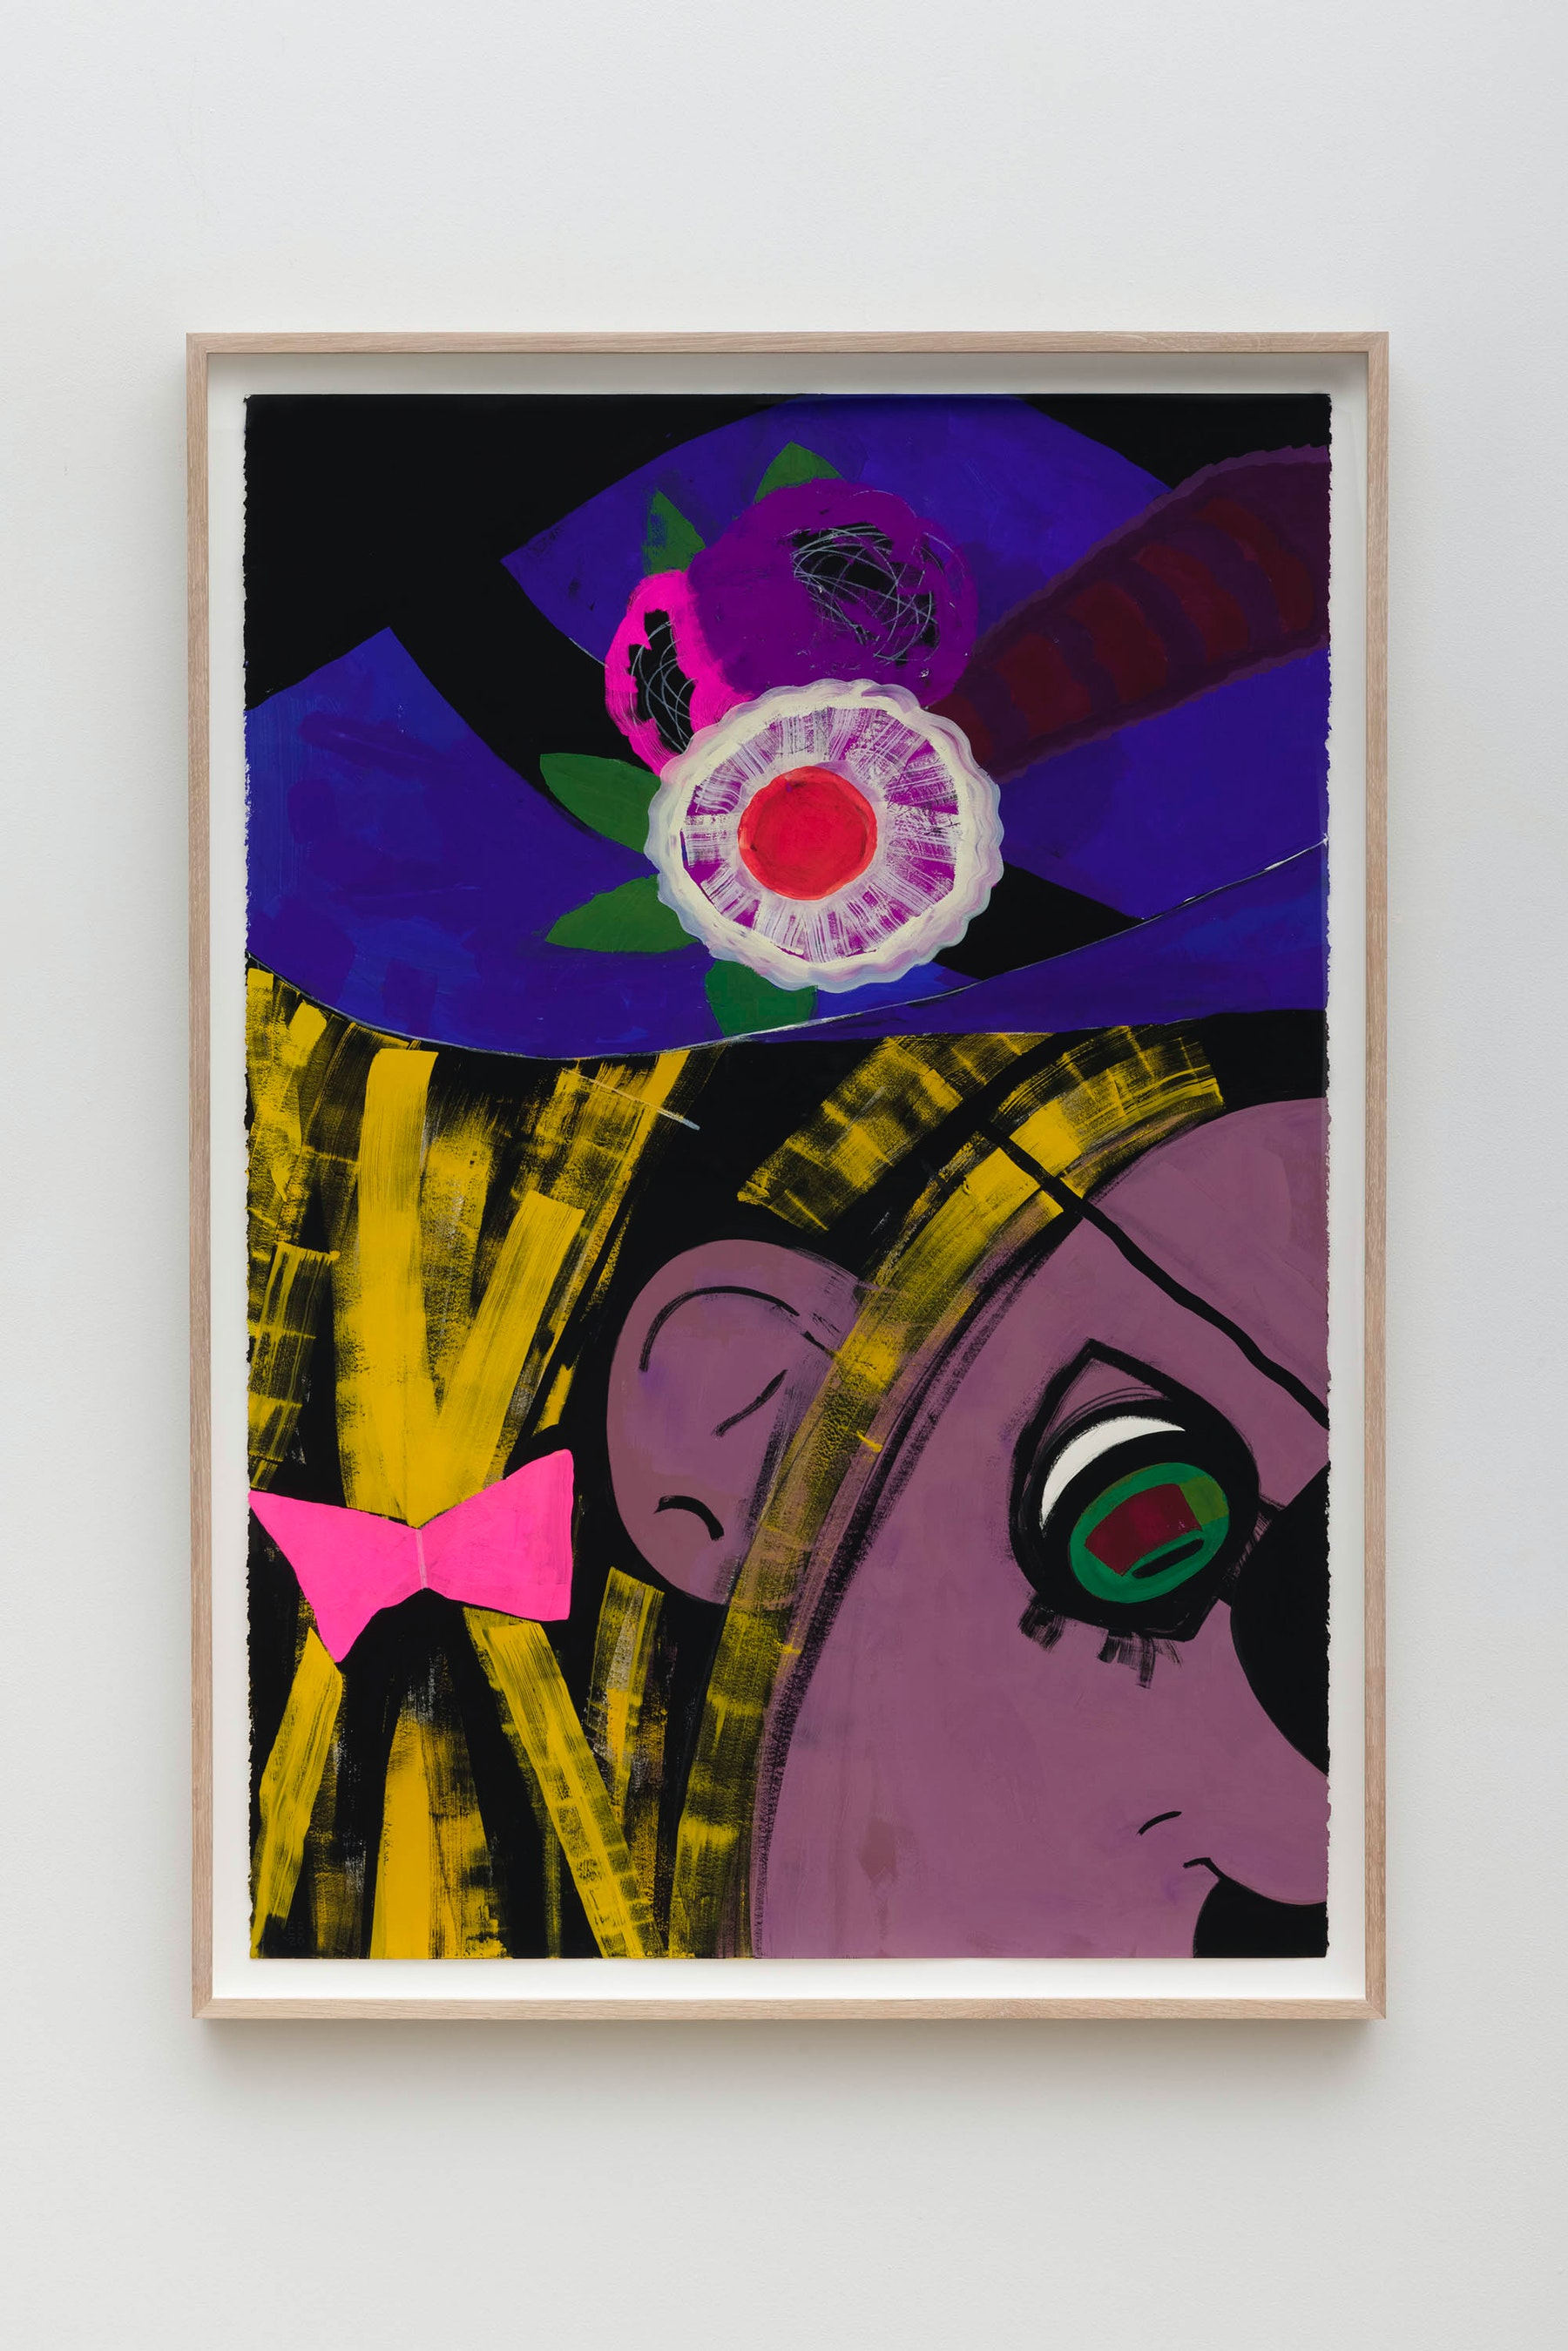 "Ellen Berkenblit ""Pink Moth,"" 2020 Gouache and graphite on Legion Stonehenge paper 47"" x 33 ¹⁄₄"" x 2"" [HxWxD] (119.38 x 84.45 x 5.08 cm), framed Inventory #BER209 Courtesy of the artist and Vielmetter Los Angeles Photo credit: Jeff McLane"